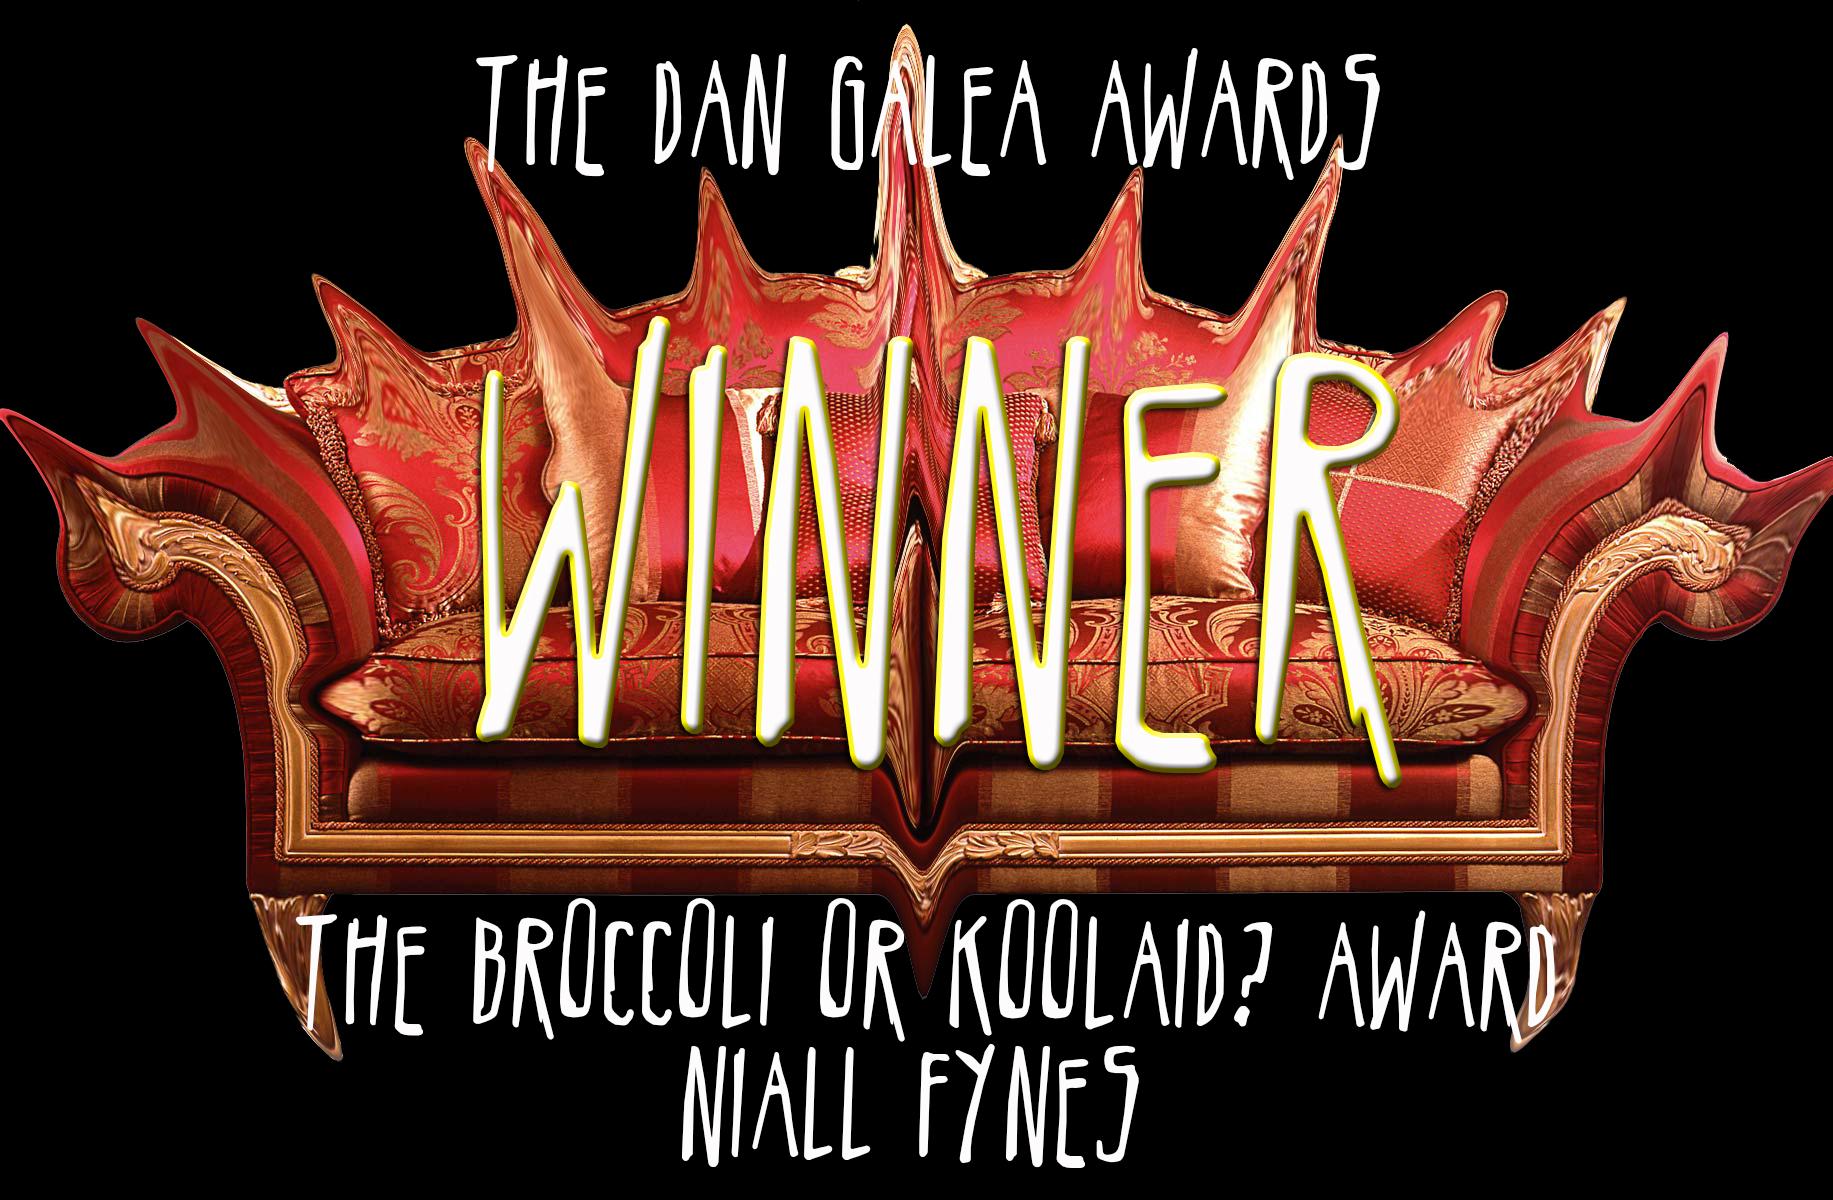 DGawards Niall Fynes.jpg